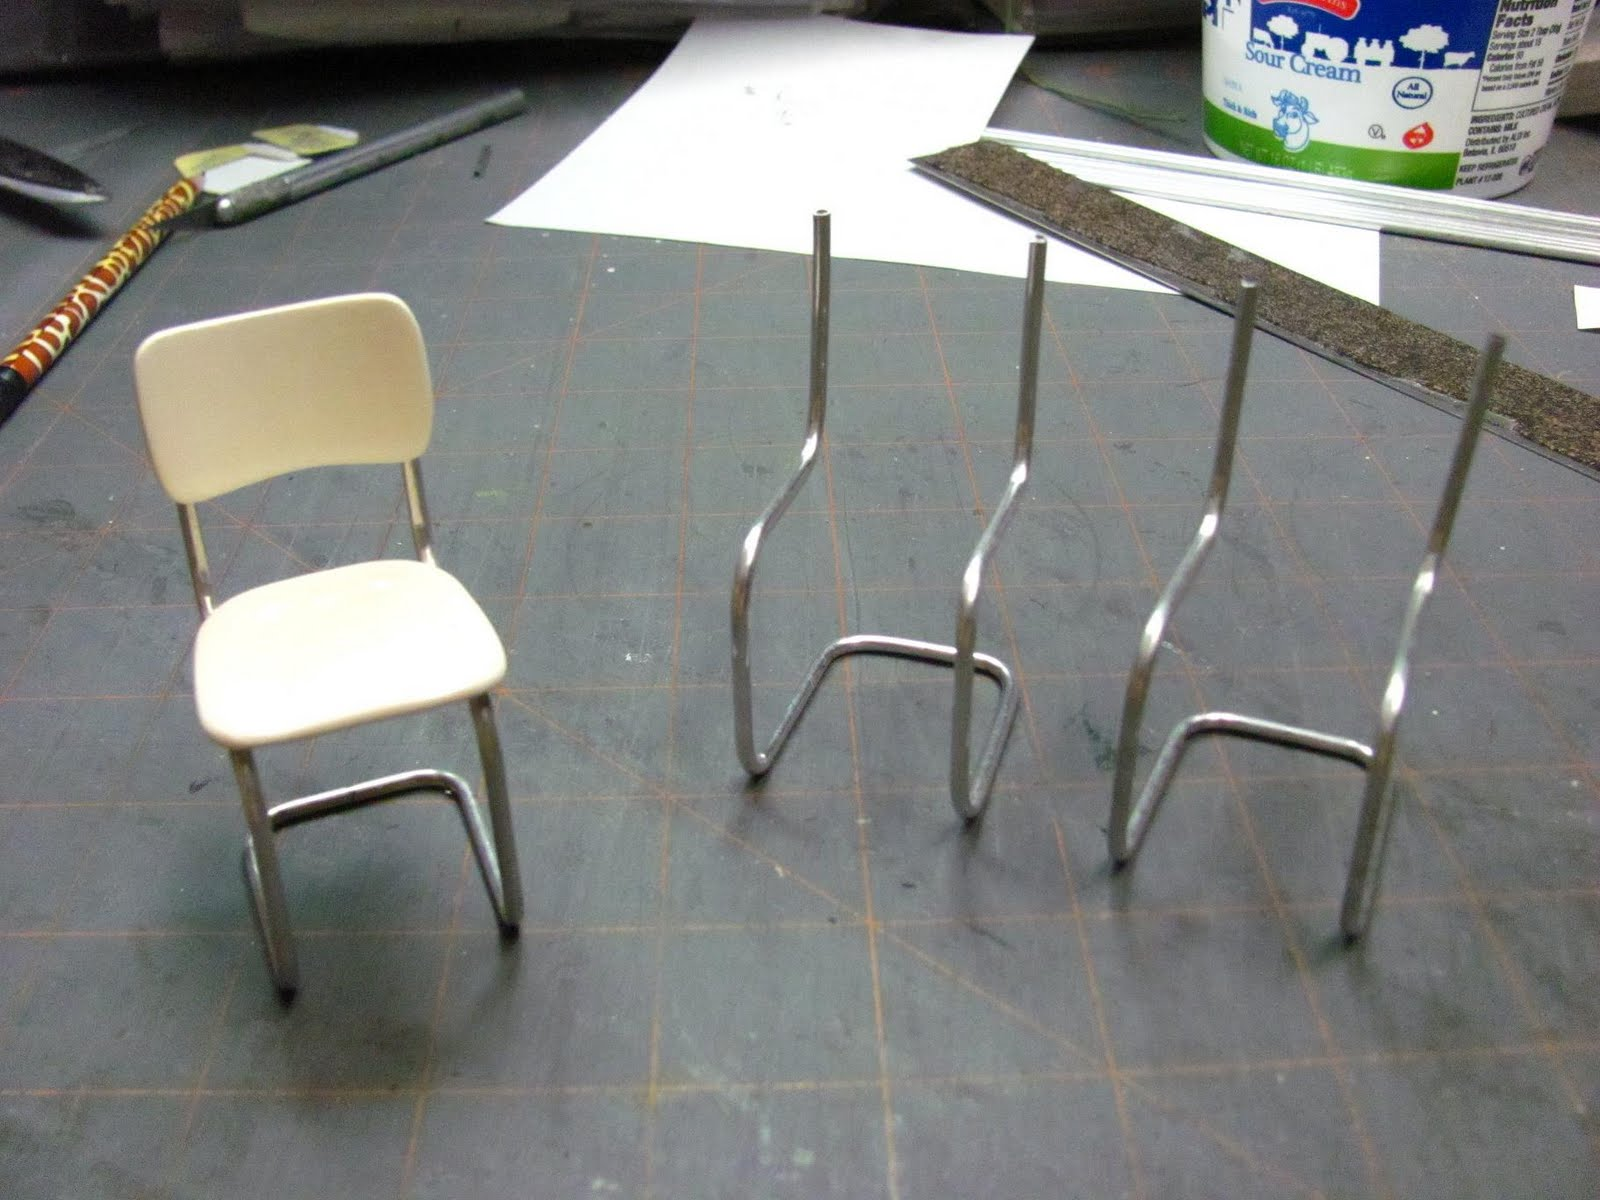 Aluminum Kitchen Chairs Wooden Cart Dollhouse Miniature Furniture Tutorials 1 Inch Minis